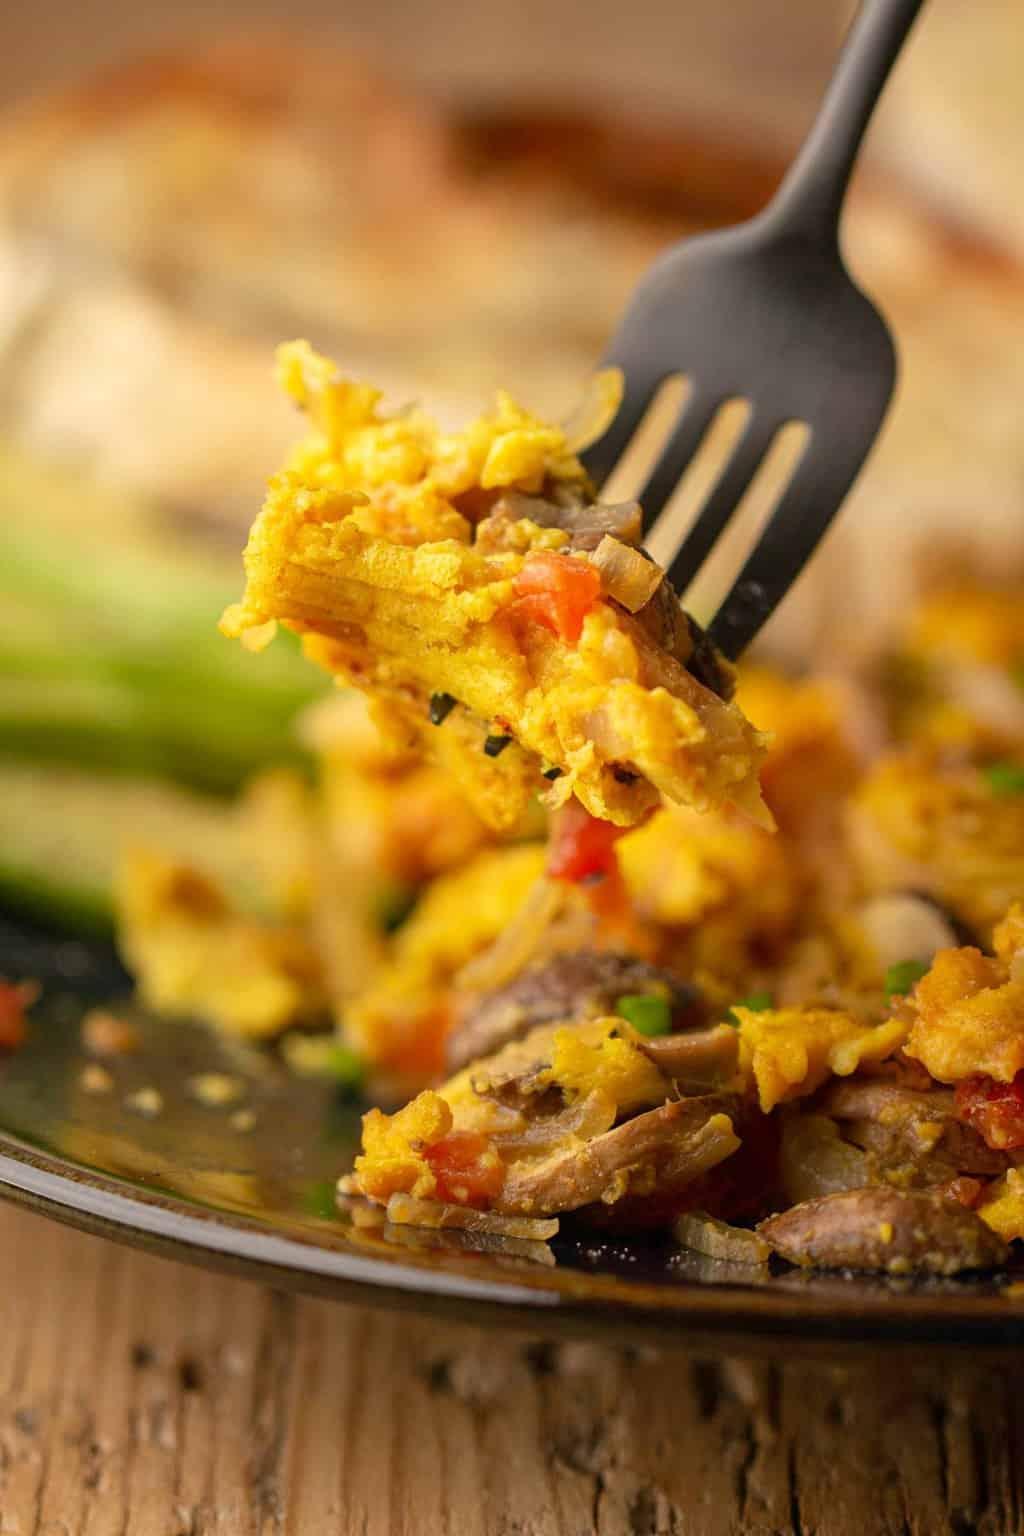 A forkful of vegan scrambled eggs.